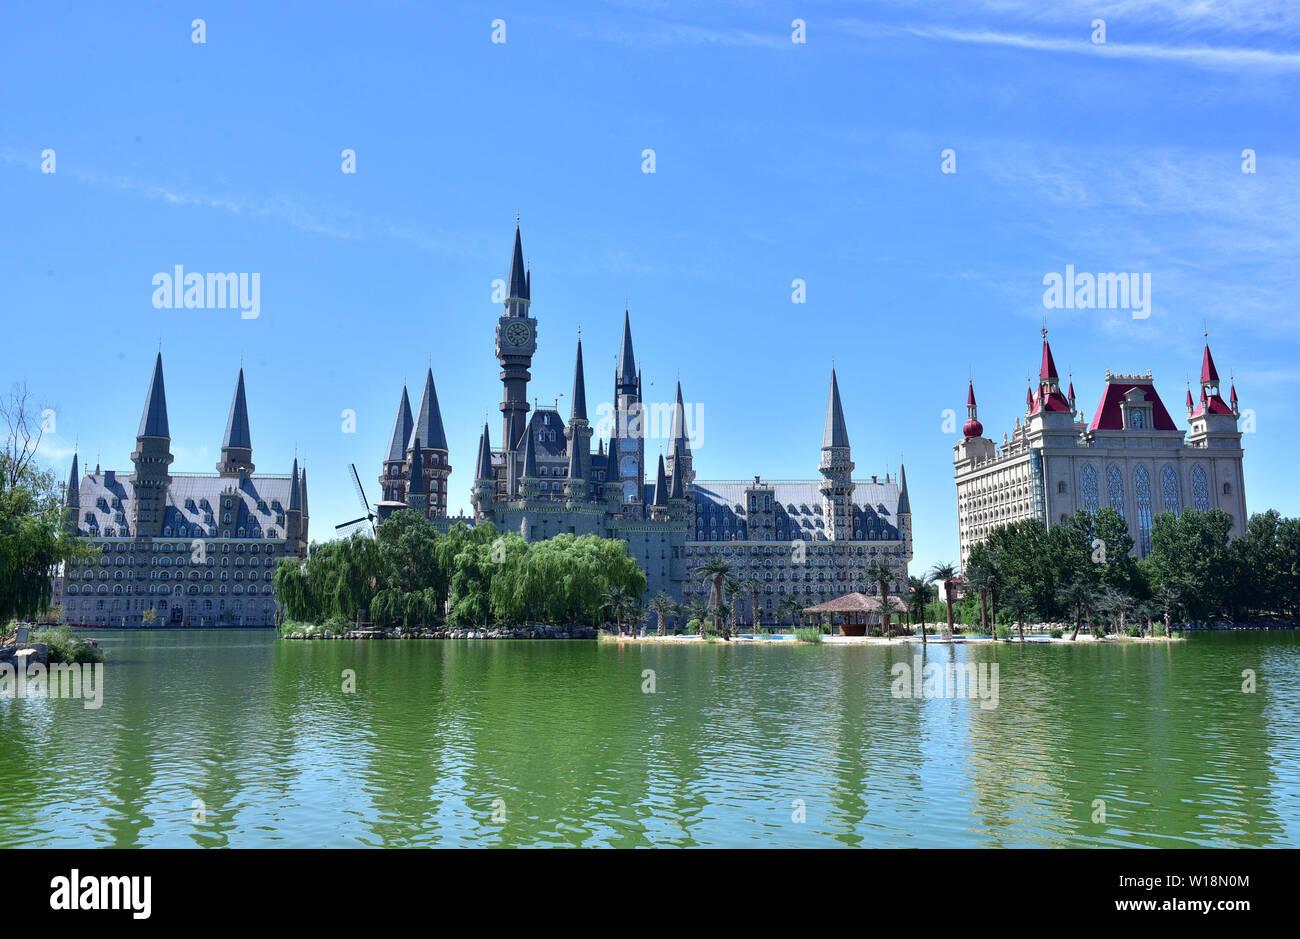 July 1 2019 Hebei Hebei China Hebei China July 1 2019 The